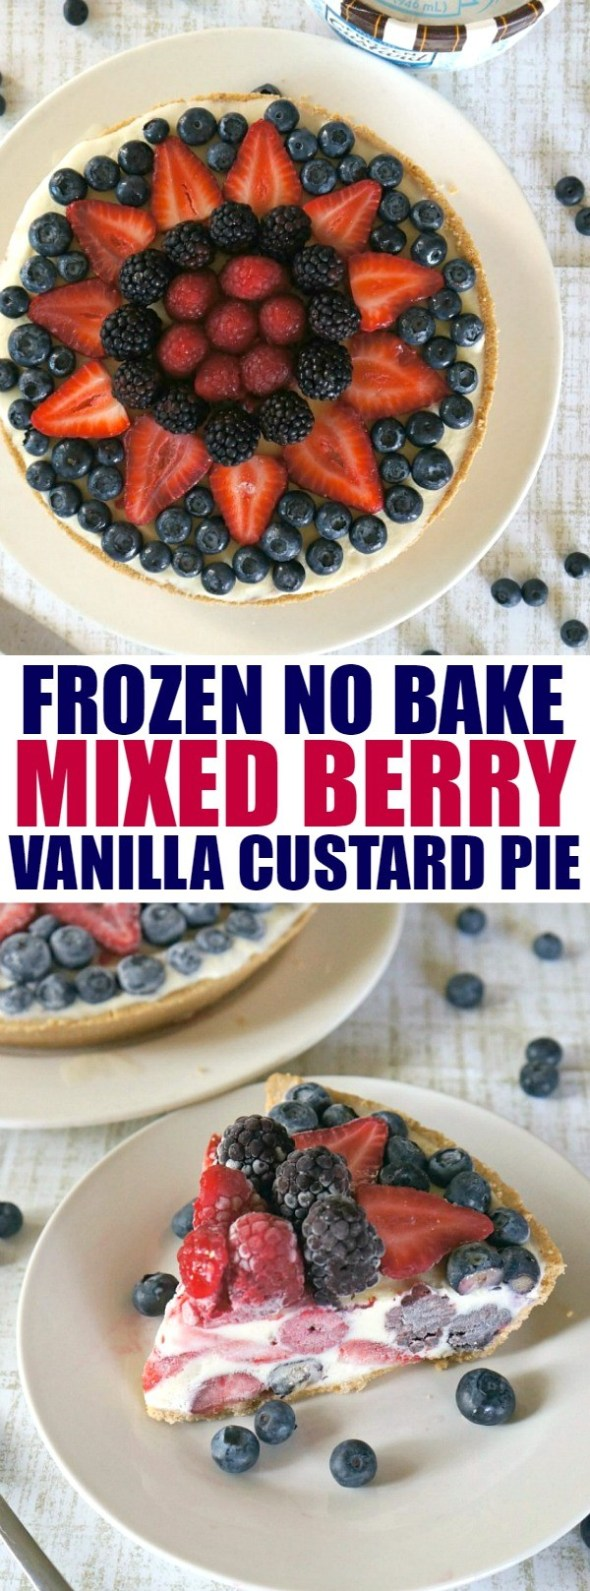 Summer Desserts: Easy Frozen Mixed Berry Custard Pie Recipe